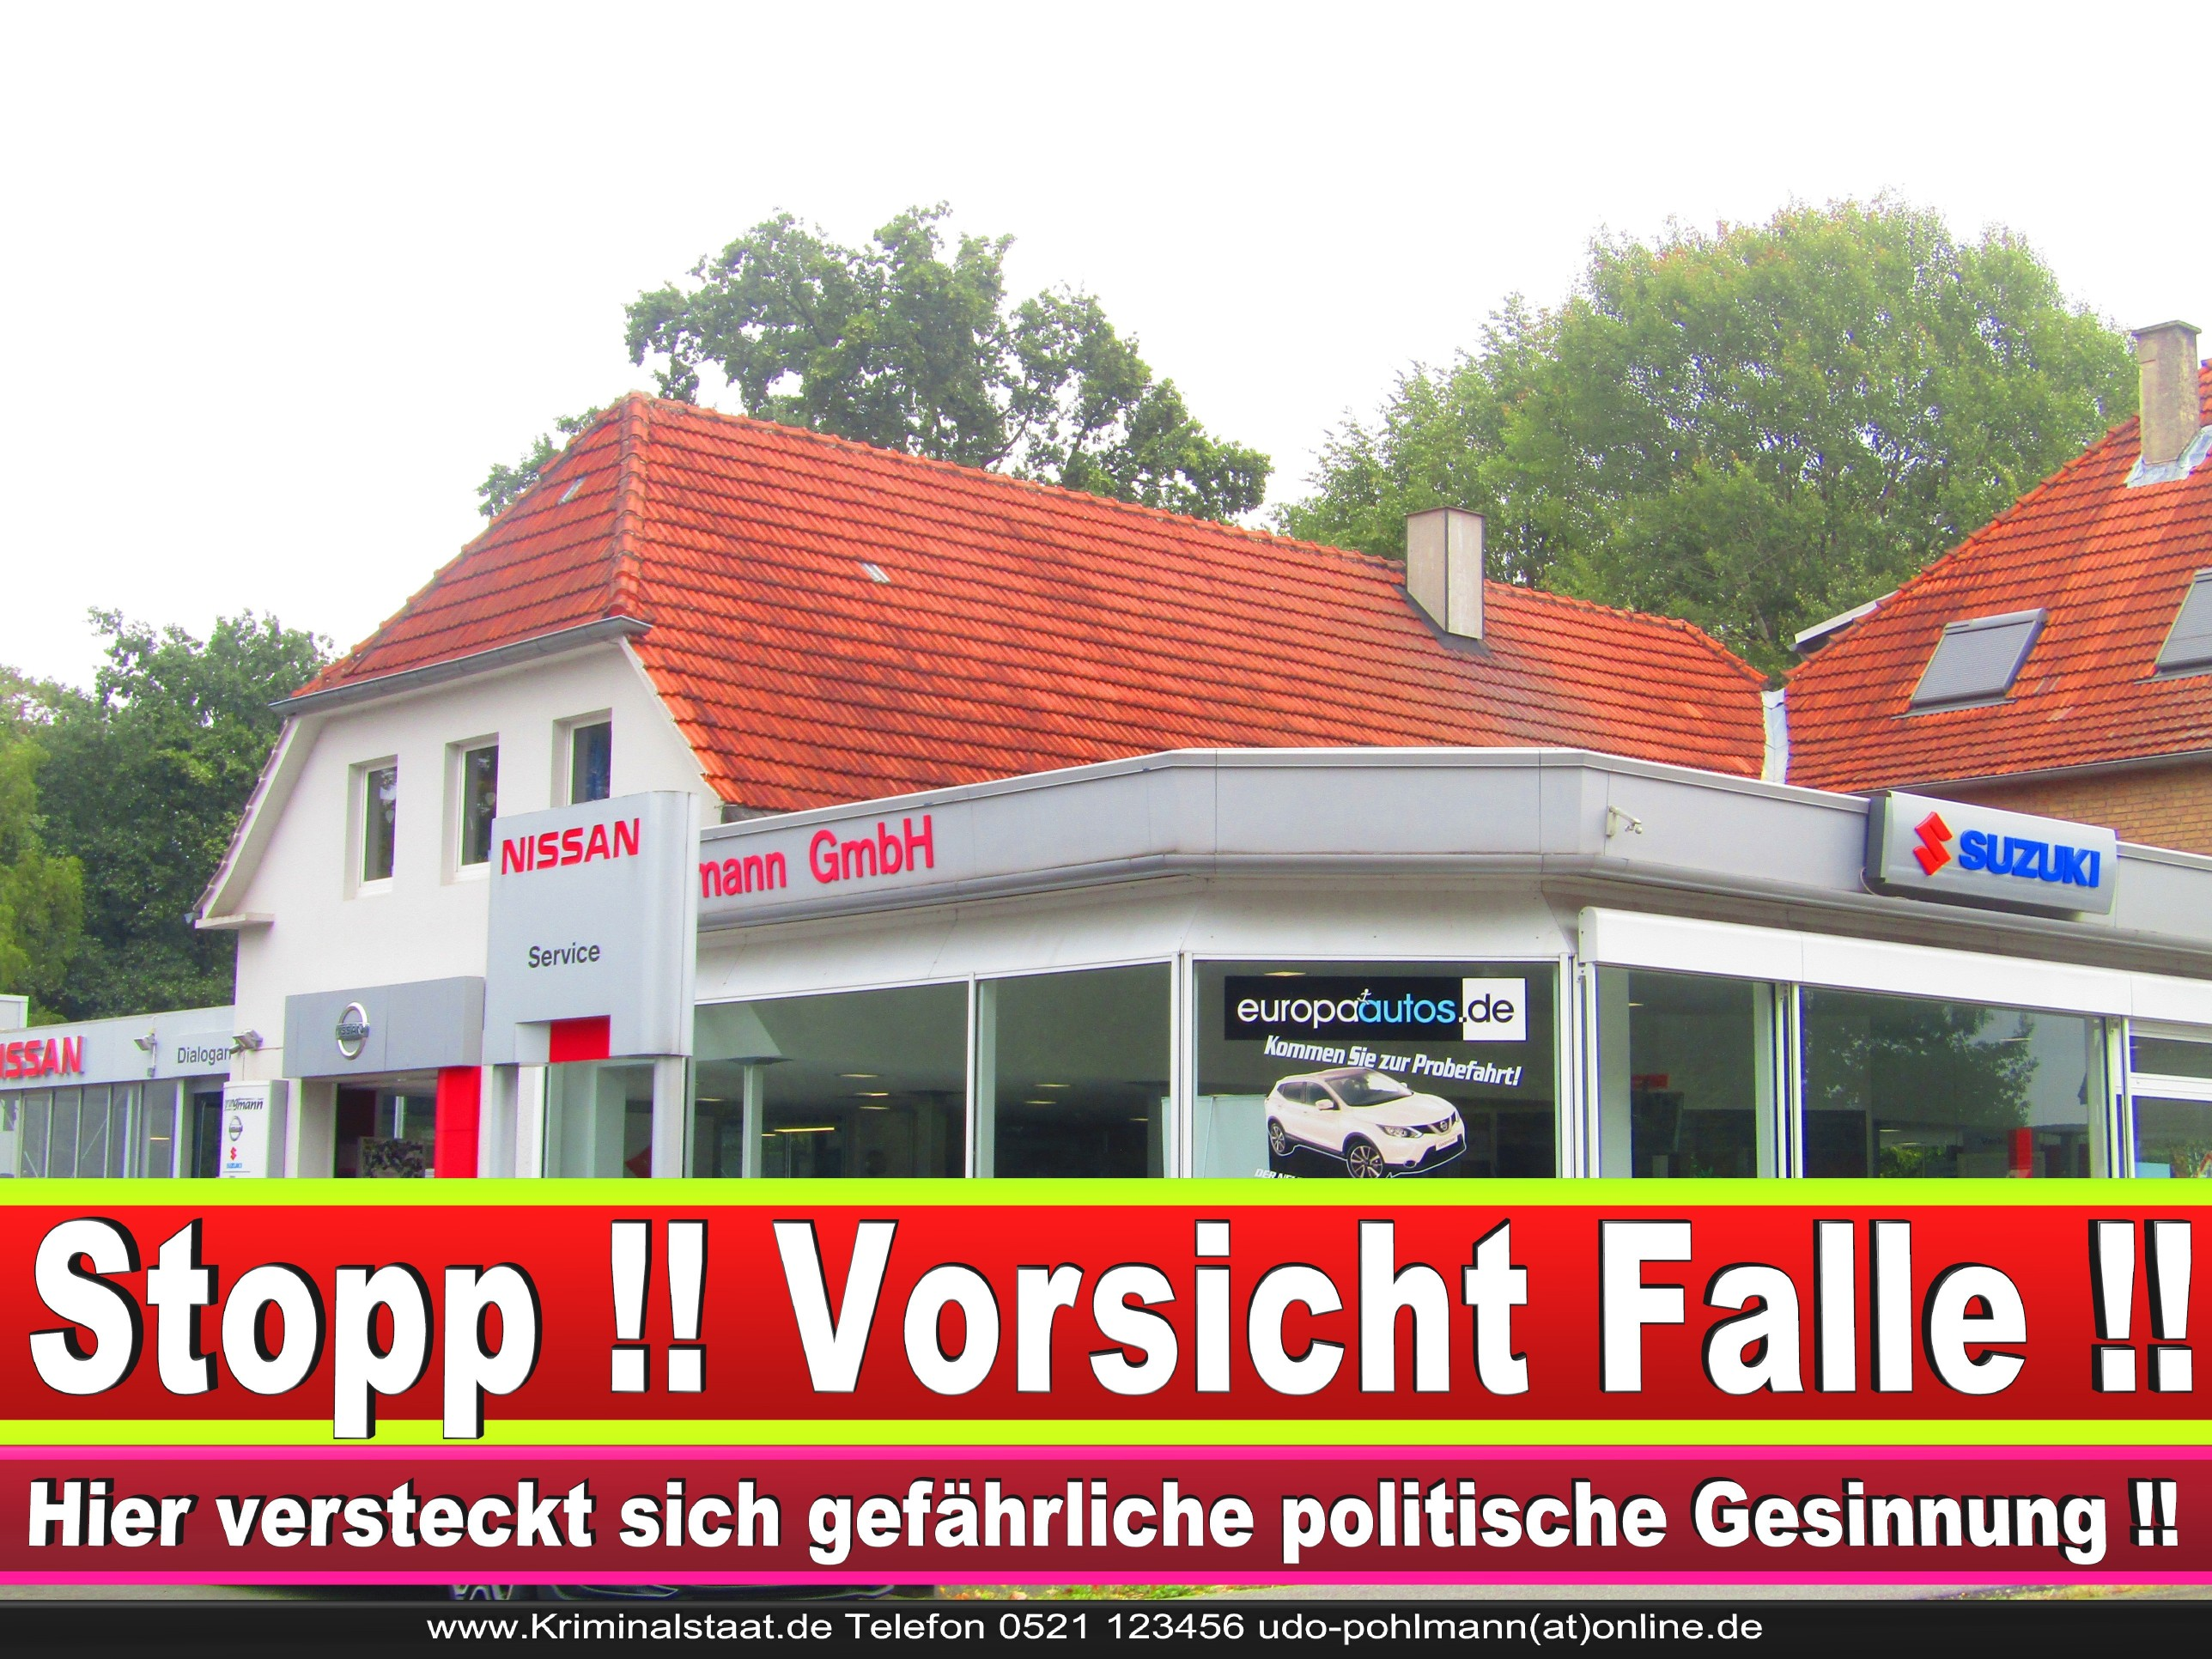 AUTOHAUS SPRUNGMANN CDU BIELEFELD 6 LANDTAGSWAHL BUNDESTAGSWAHL BÜRGERMEISTERWAHL